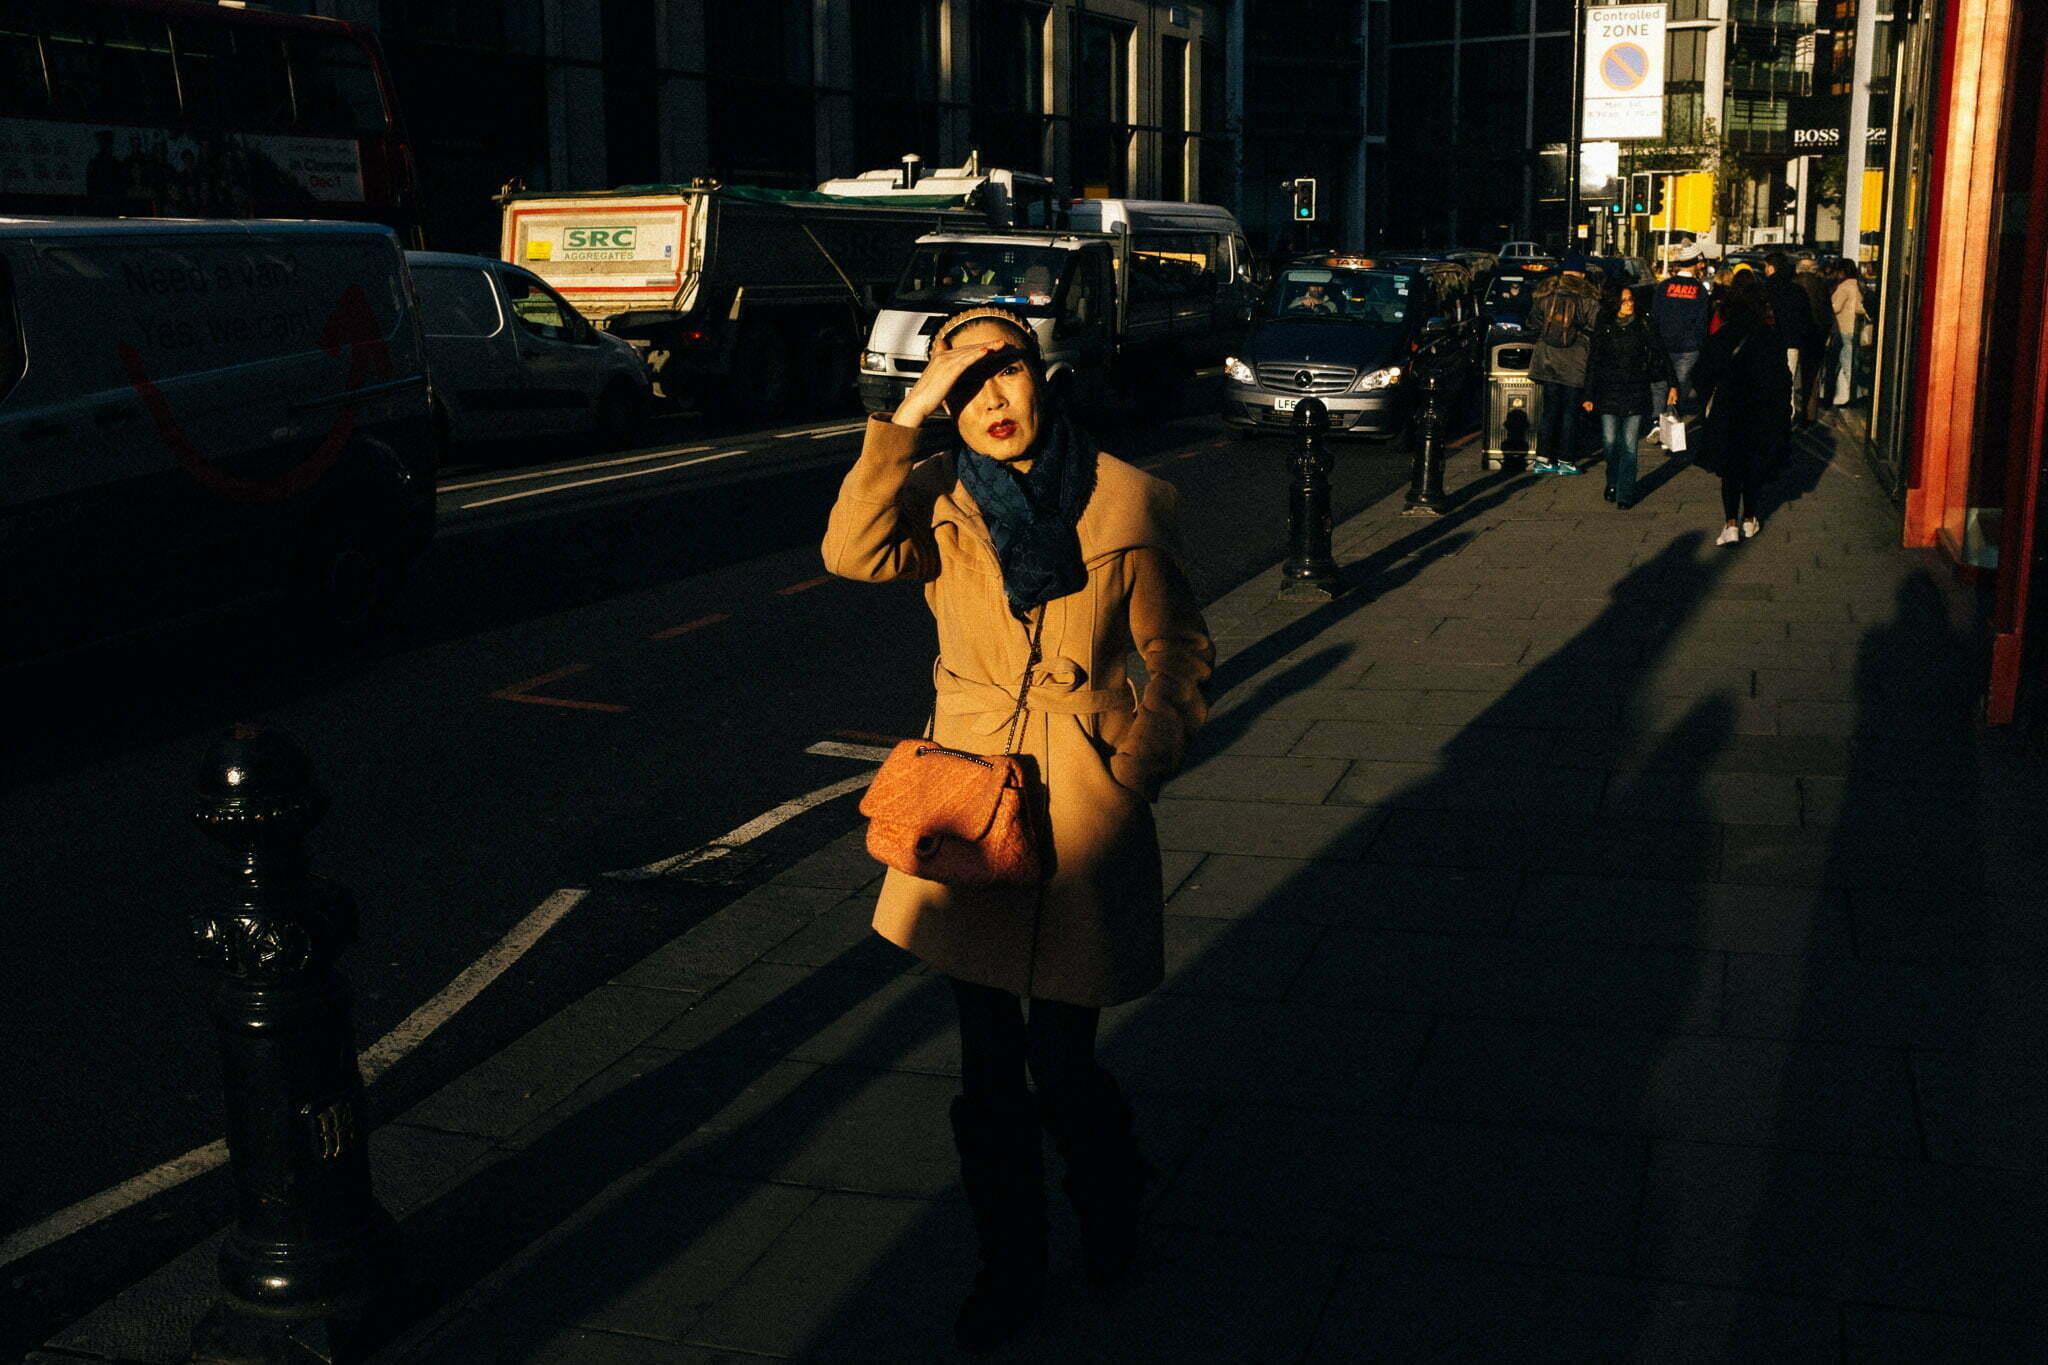 london-street-8025-pete-carr